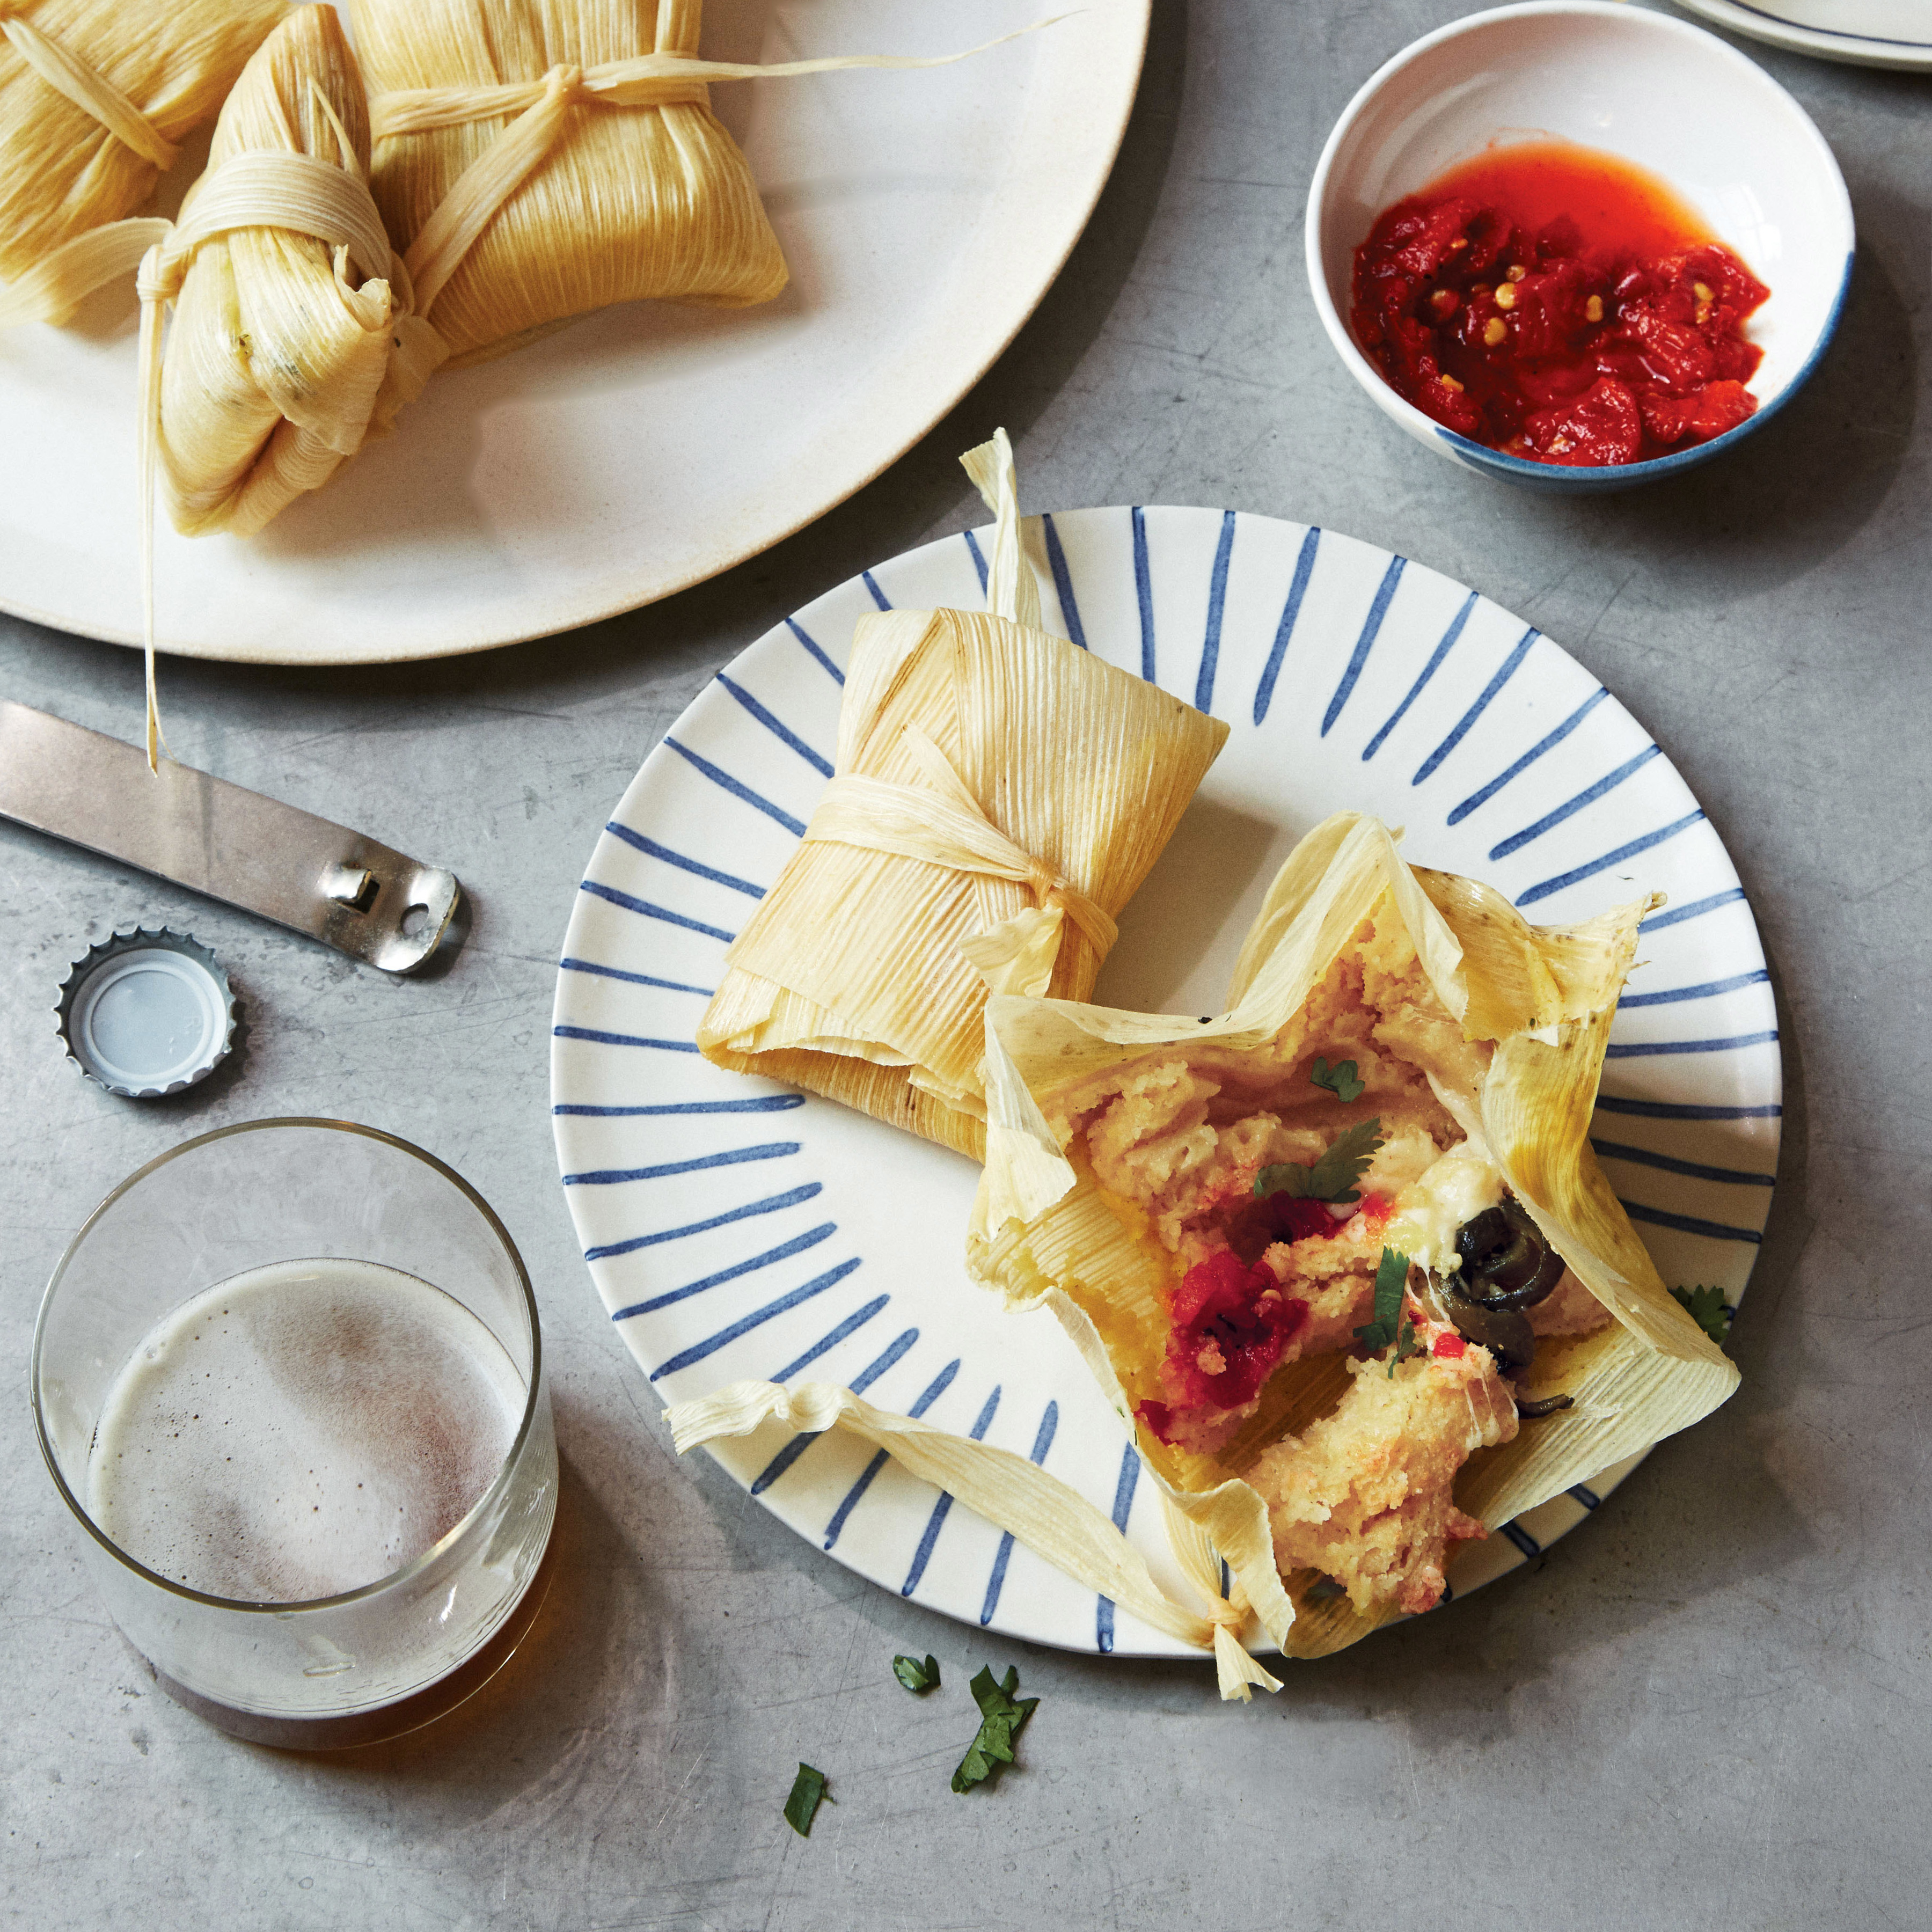 pressure cooker rajas tamales plates glass